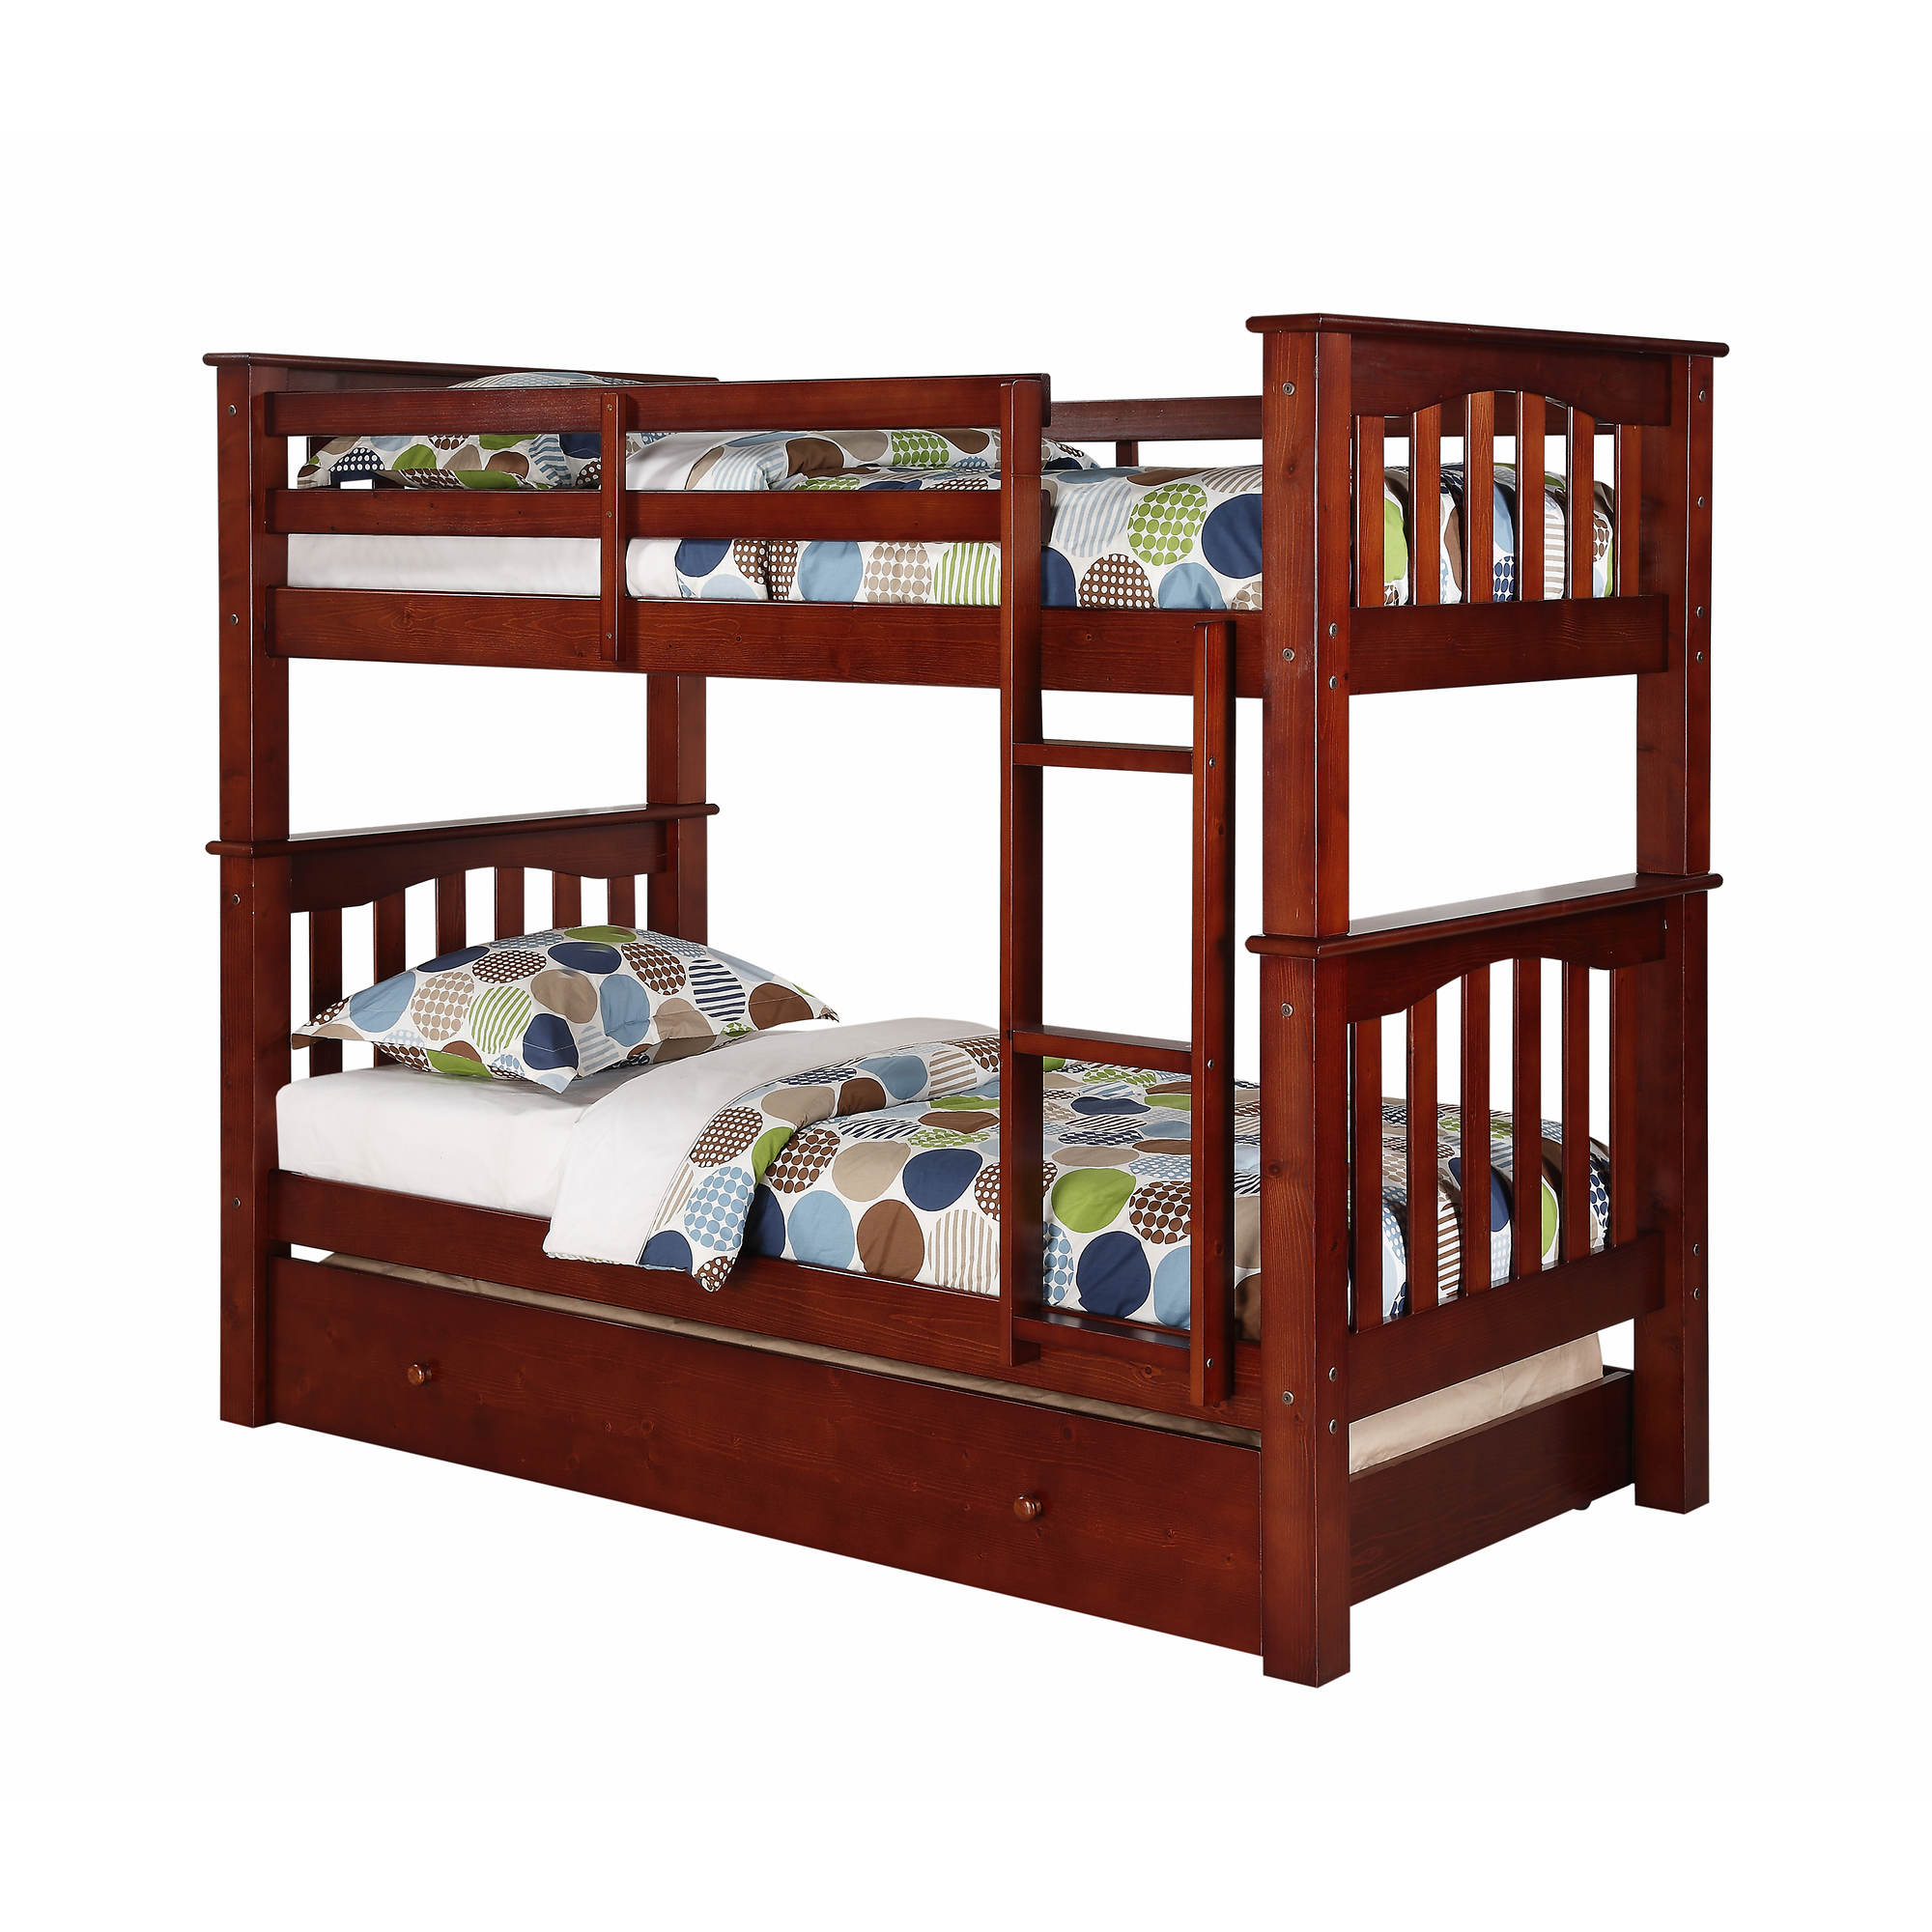 Berkley Jensen Twin Size Bunk Bed With Trundle Bj 39 S